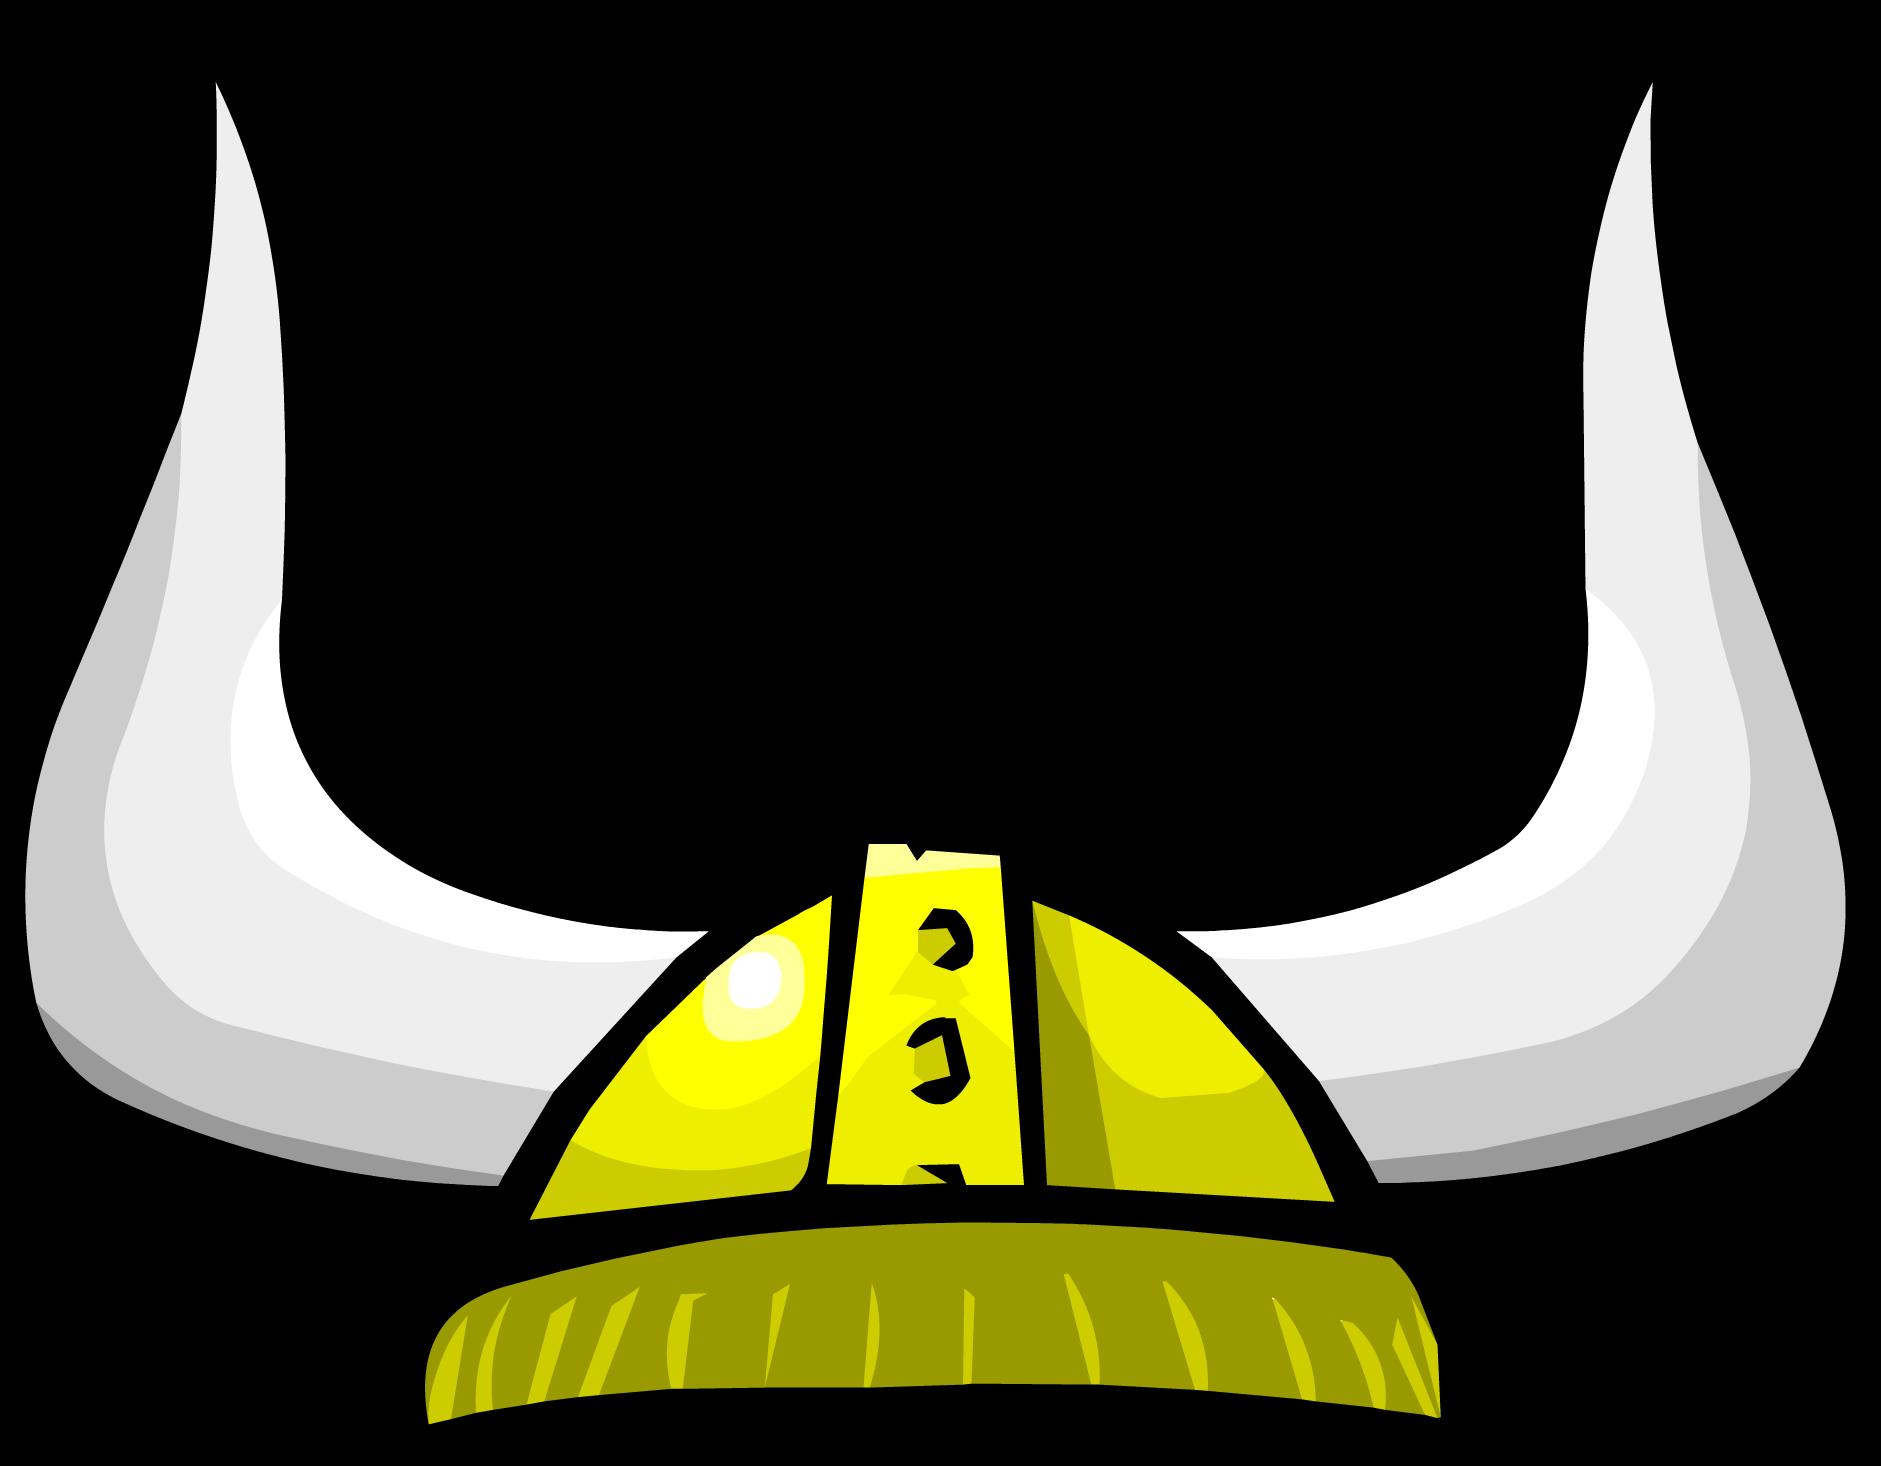 Free Viking Hat Png, Download Free Clip Art, Free Clip Art.